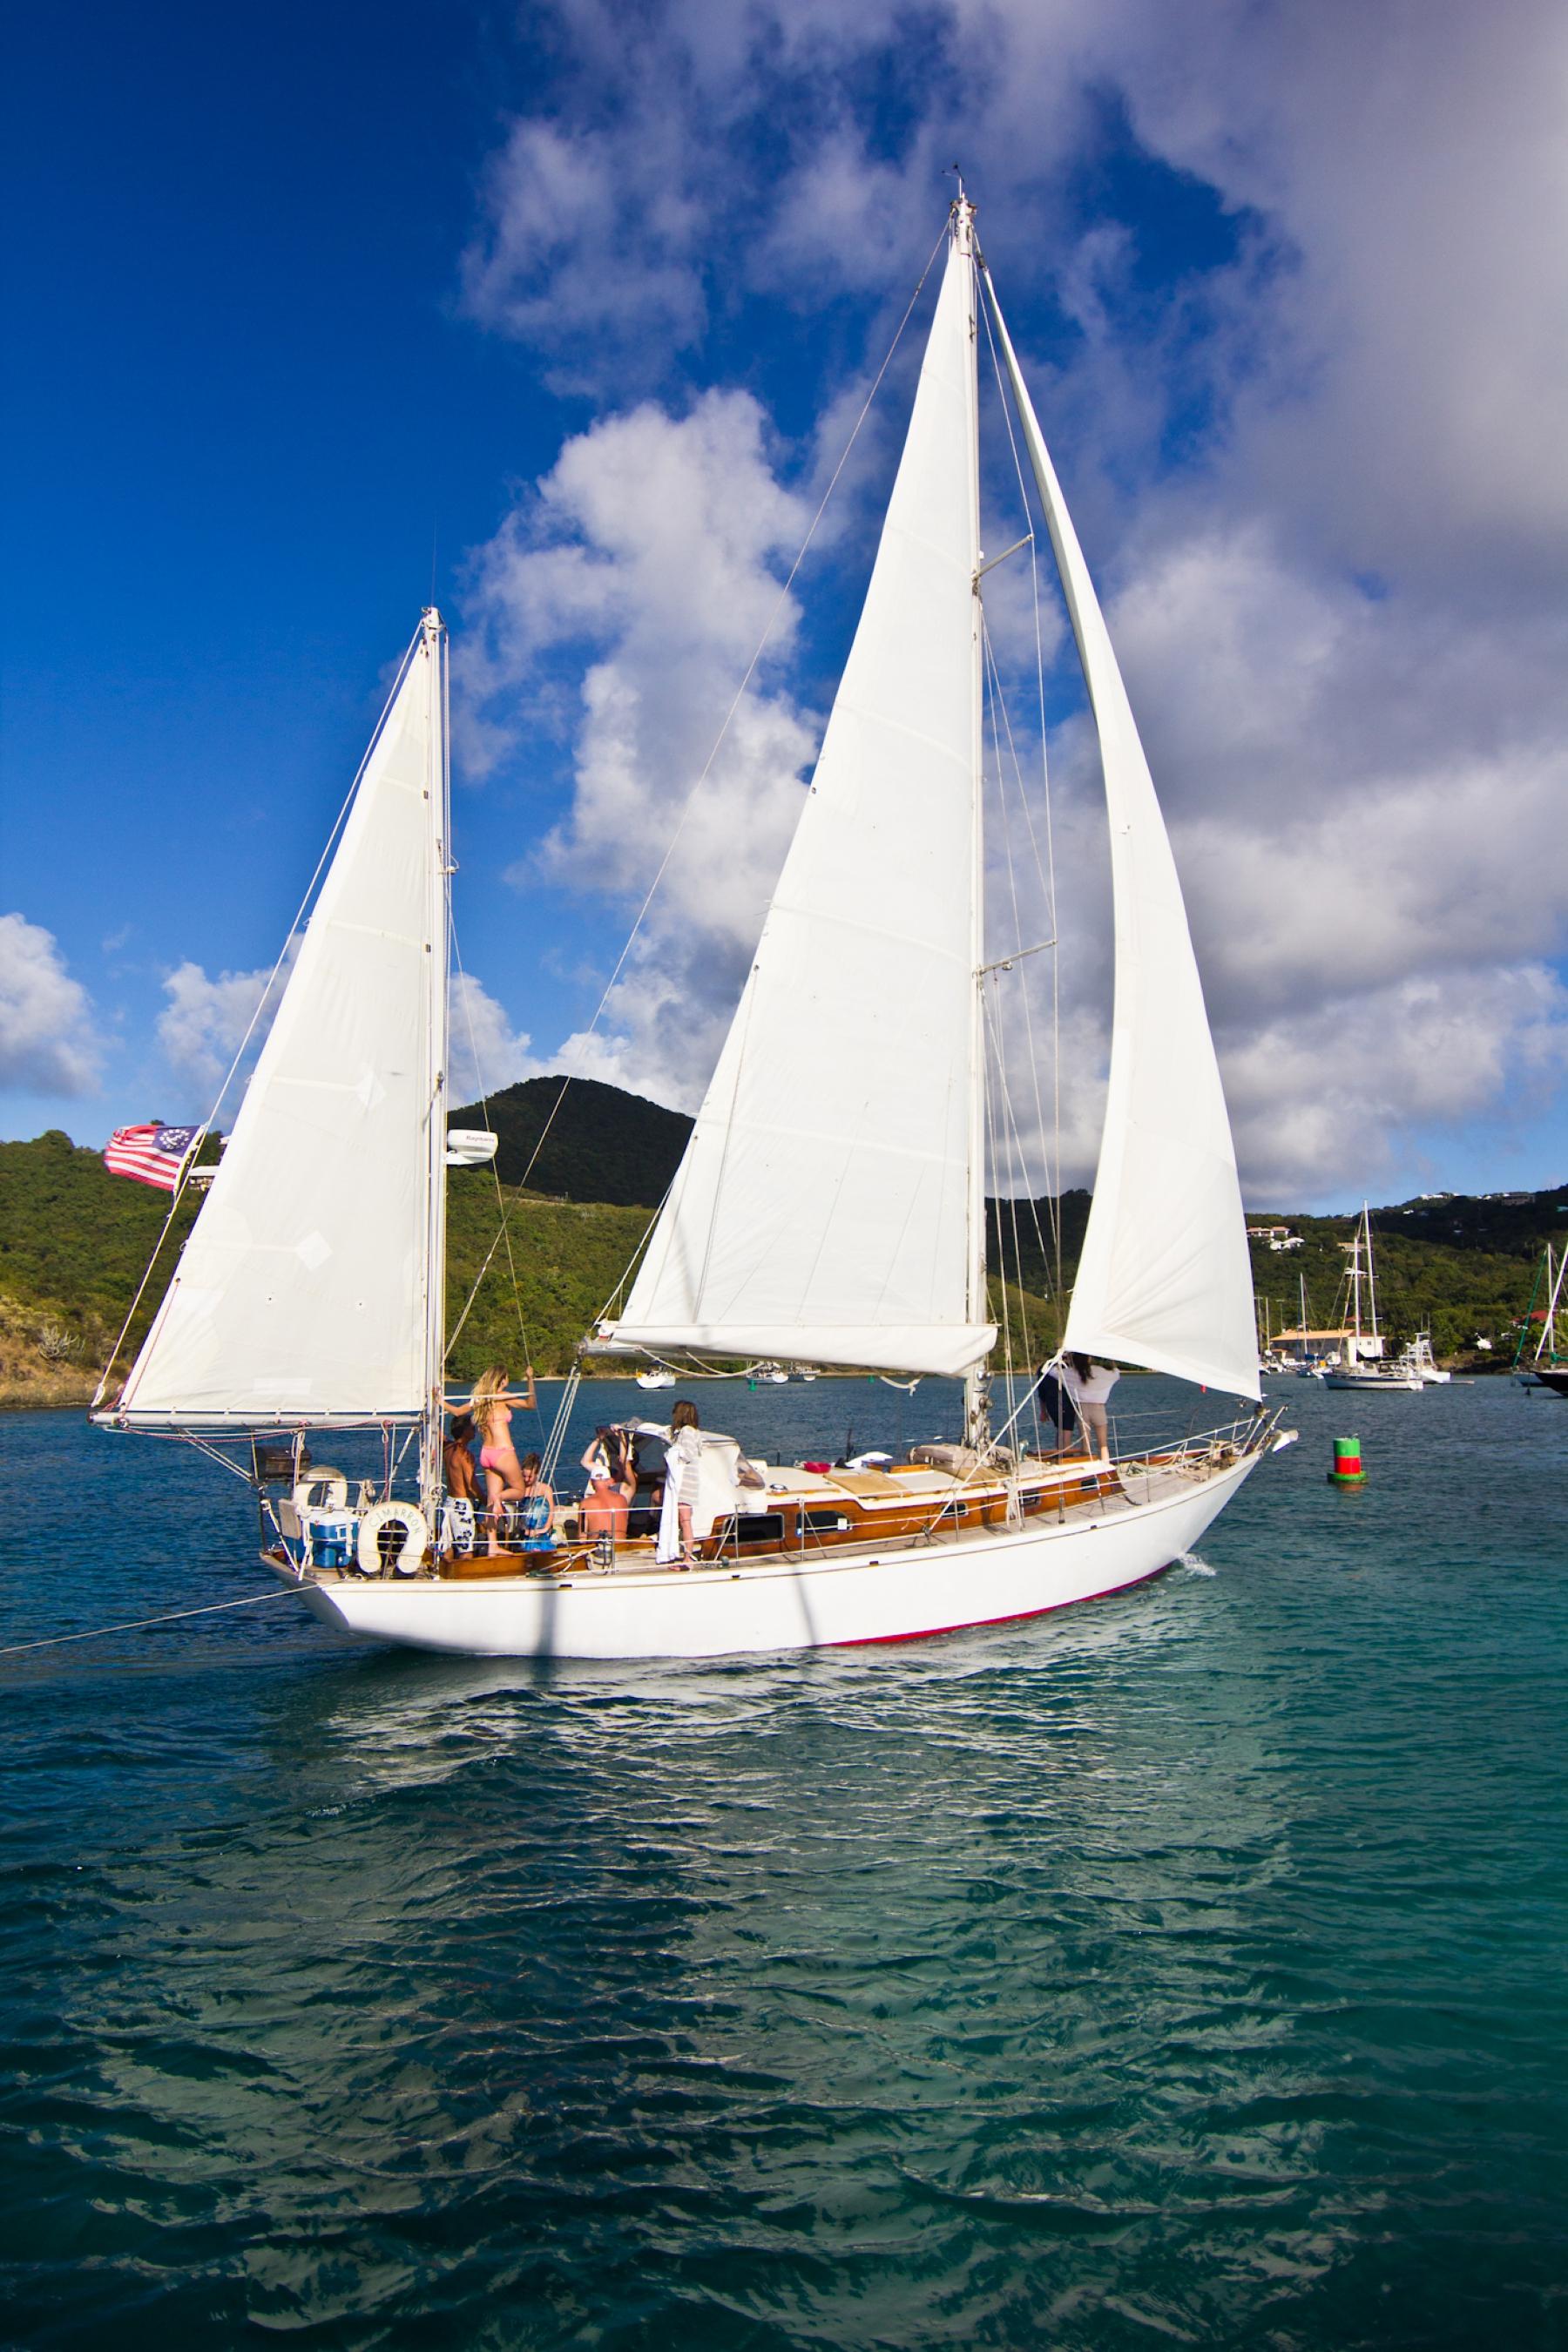 cimmaron-sail-charters-st-john-virgin-islands-sailing_0017.jpg